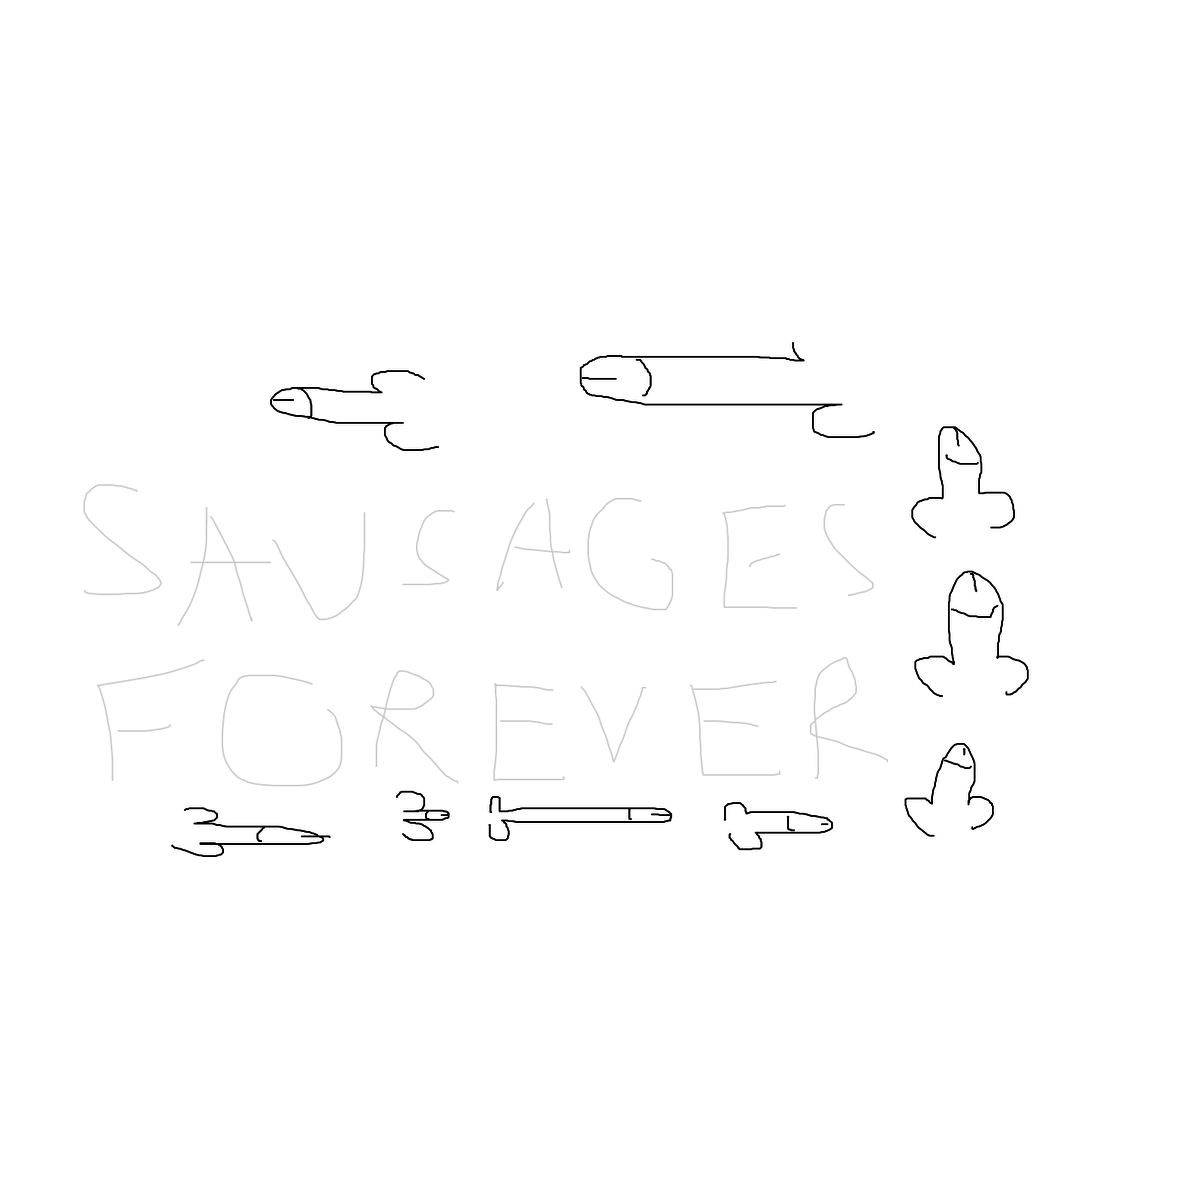 BAAAM drawing#8150 lat:46.9886817932128900lng: 6.9232444763183590